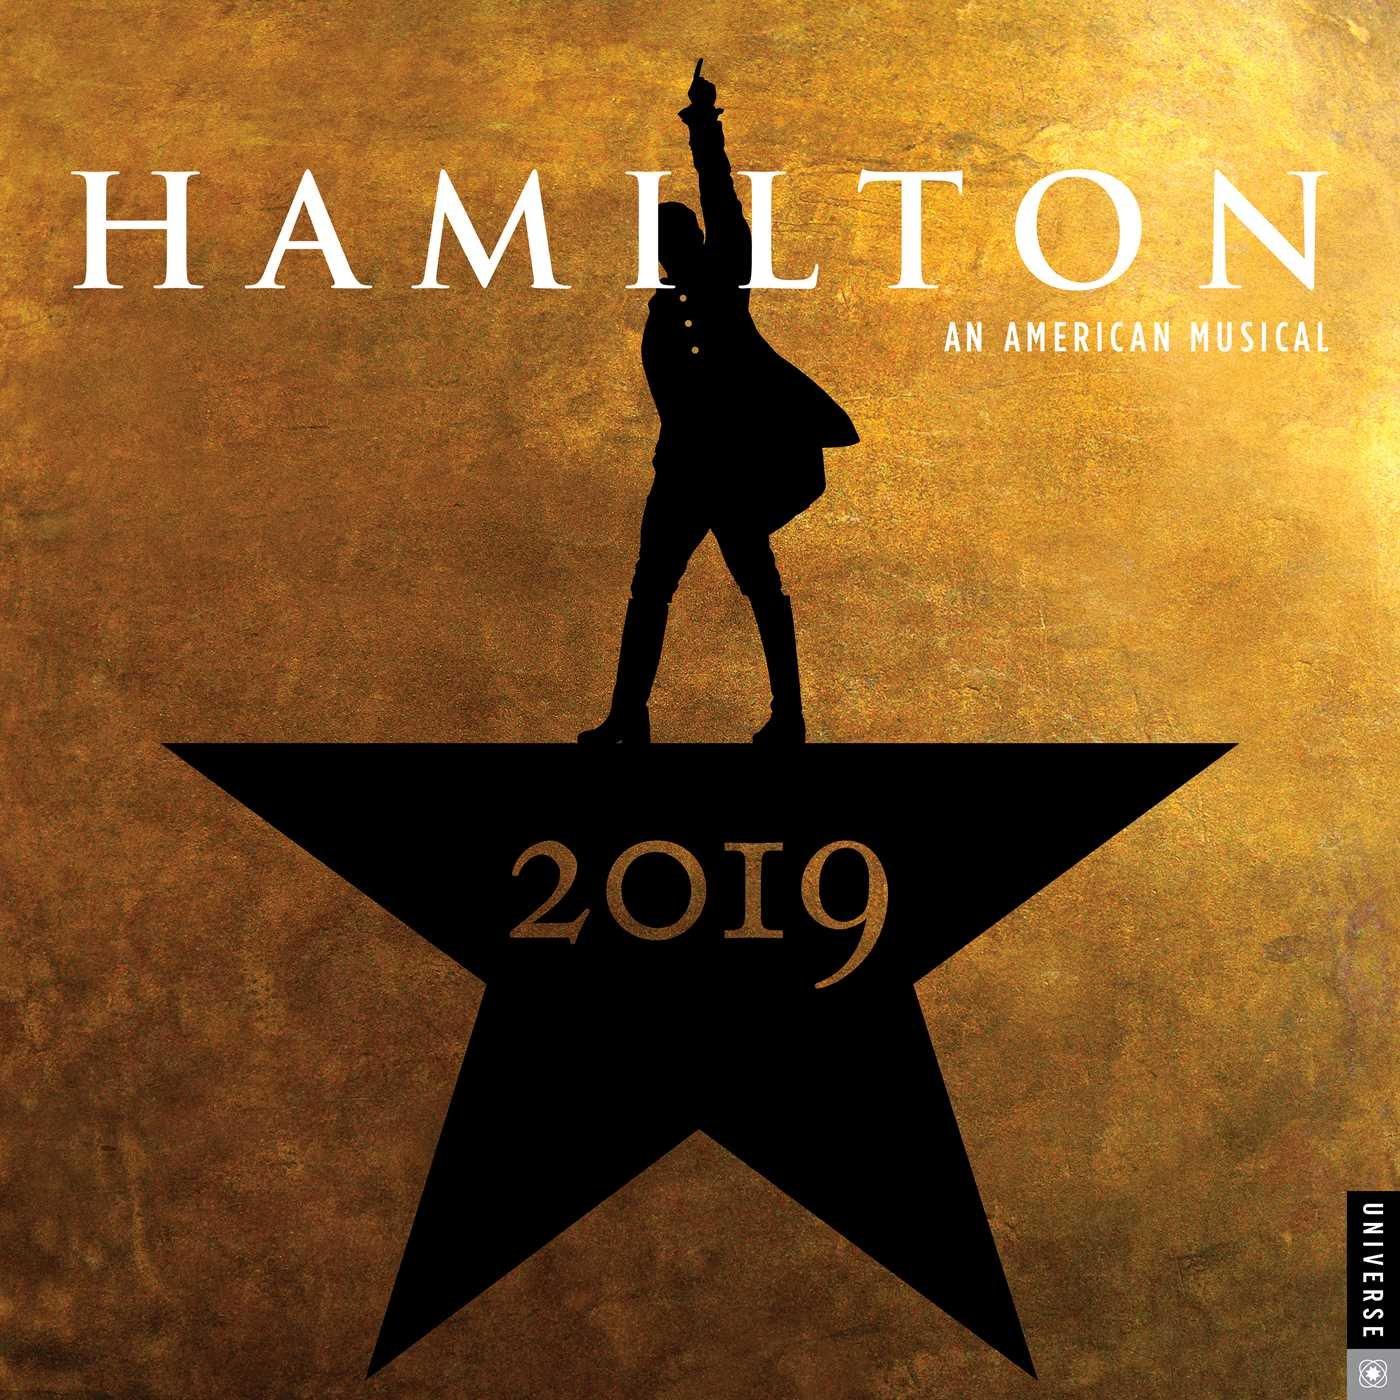 Hamilton 2019 Square Wall Calendar: Amazon.co.uk: Andrews McMeel:  9780789334992: Books